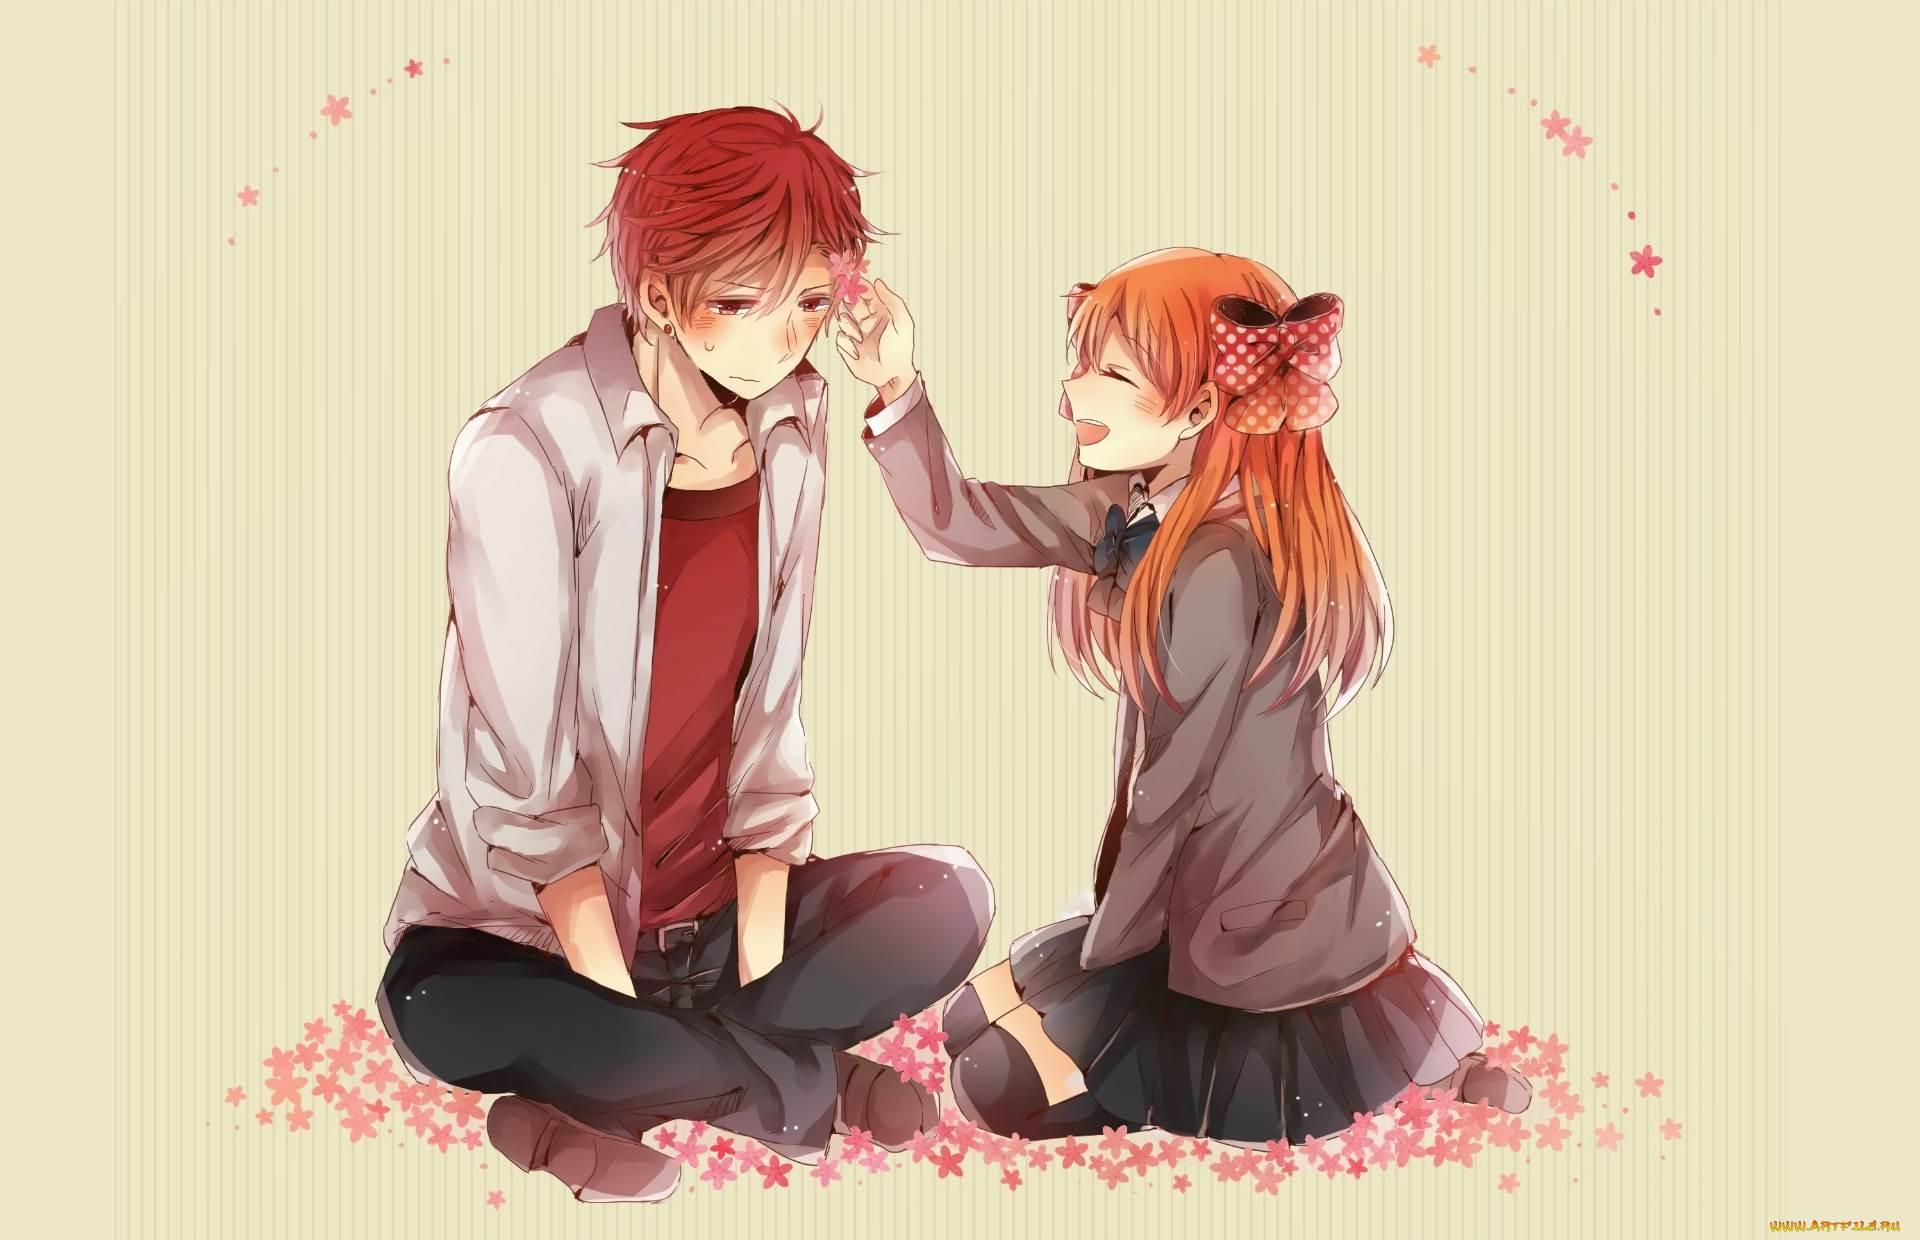 Картинка девушки и парня аниме